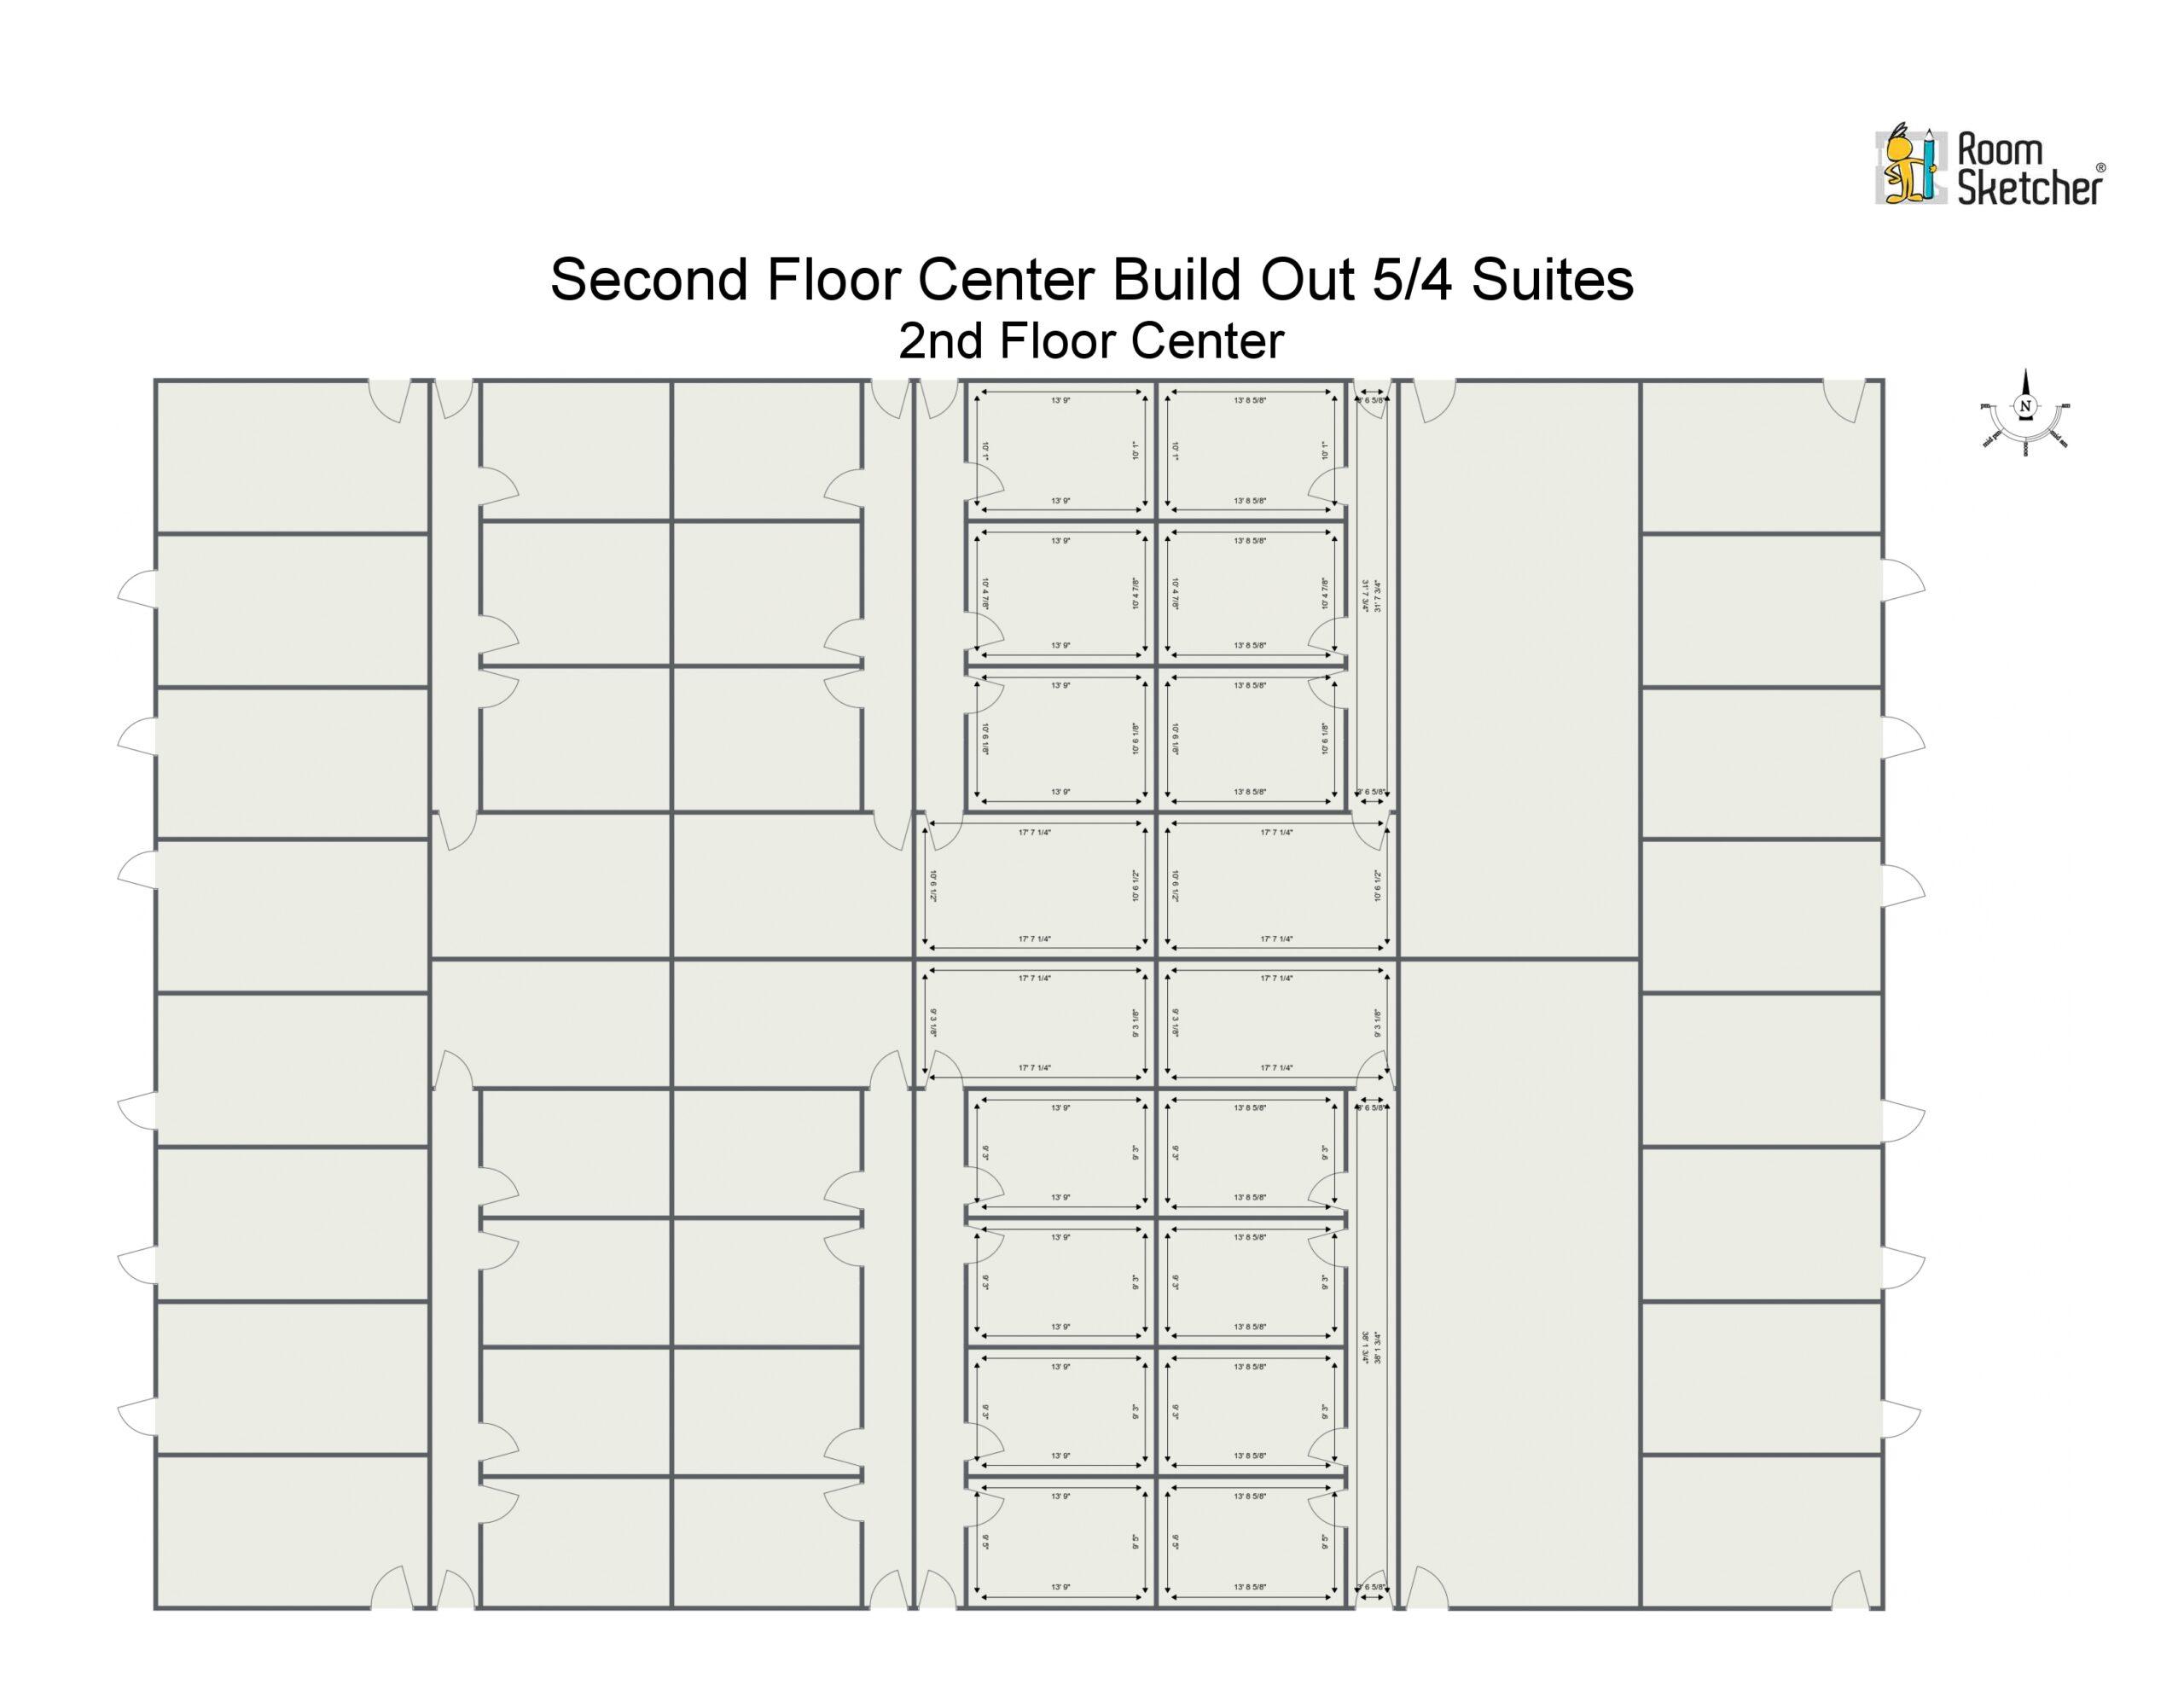 Second Floor 200-900 SF